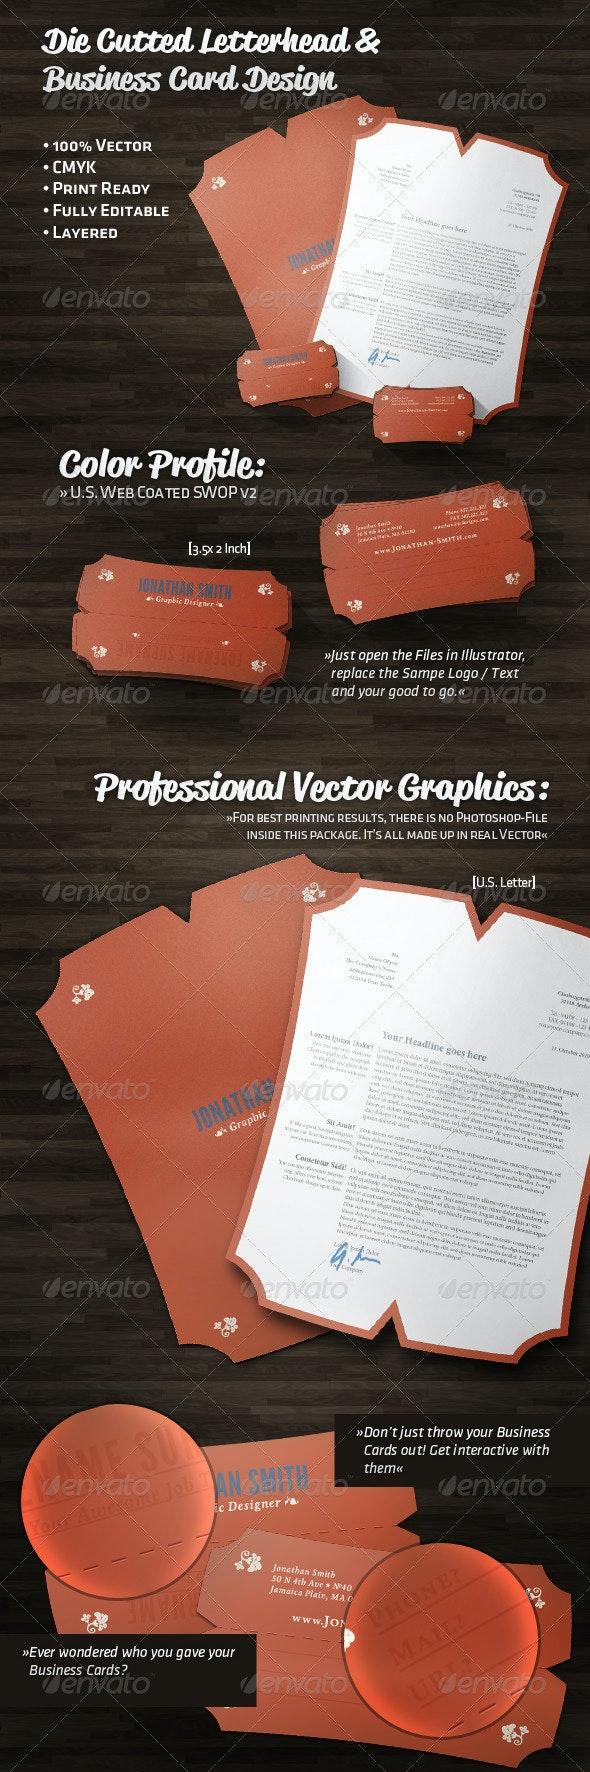 Unique Business Card and Letterhead Design - Corporate Business Cards